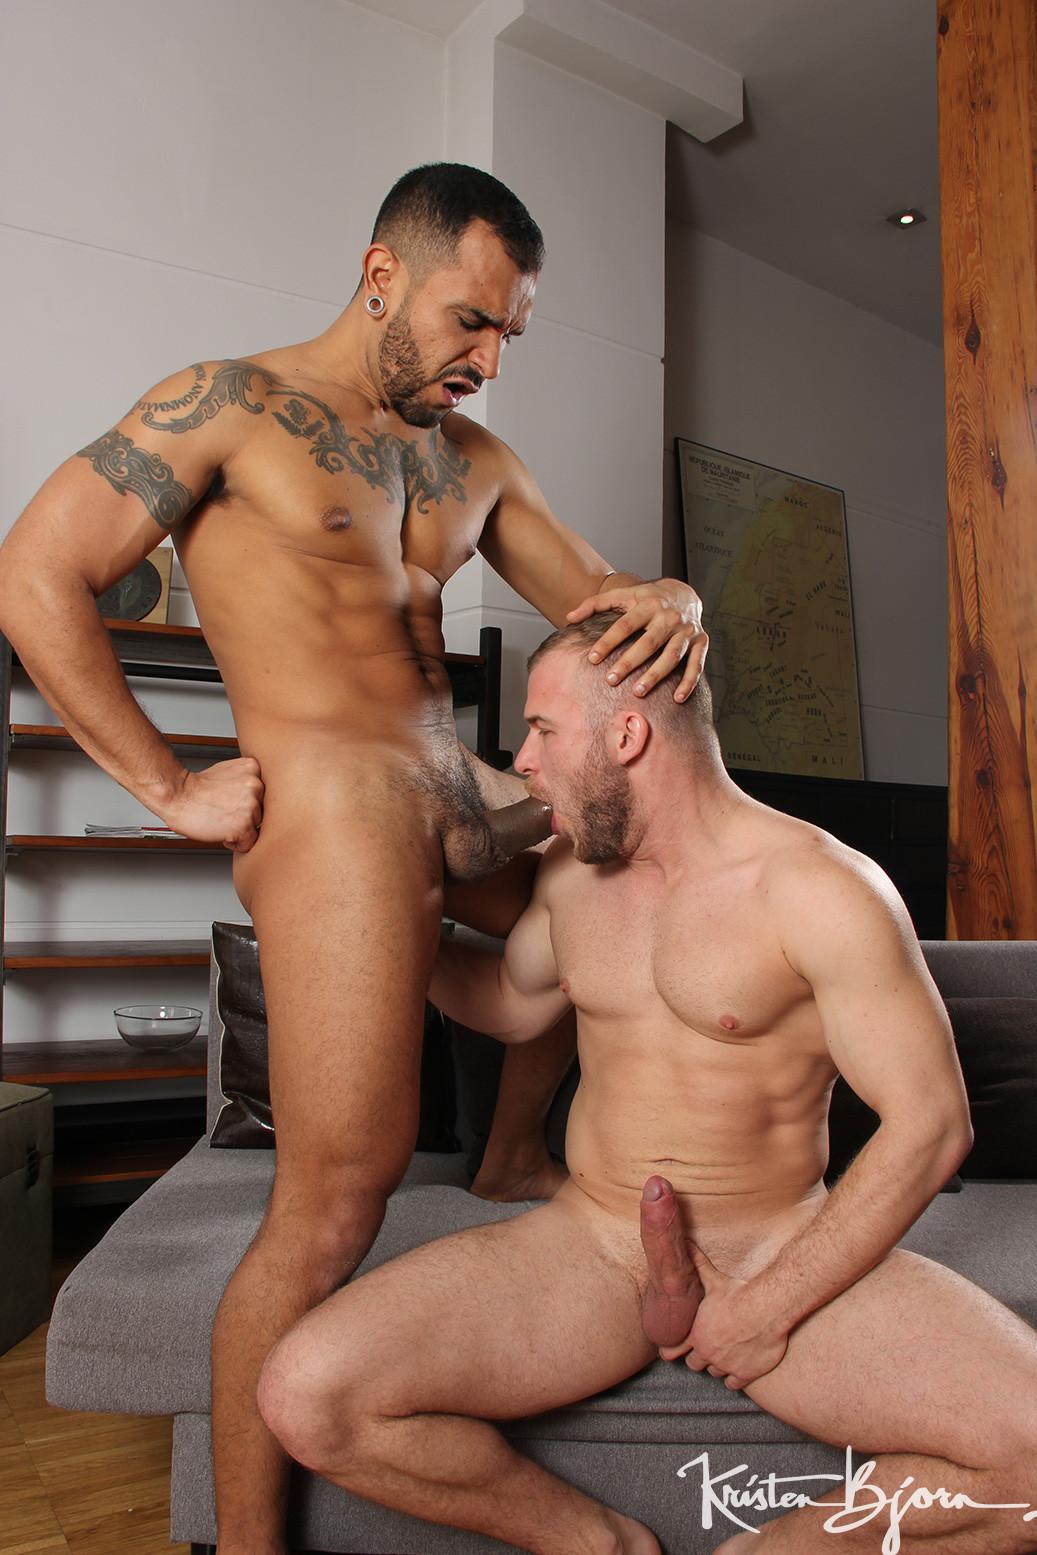 KB_Tempting_My_Roommate_Lucio_Saints_and_Malek_Tobias_720p_s3.jpg